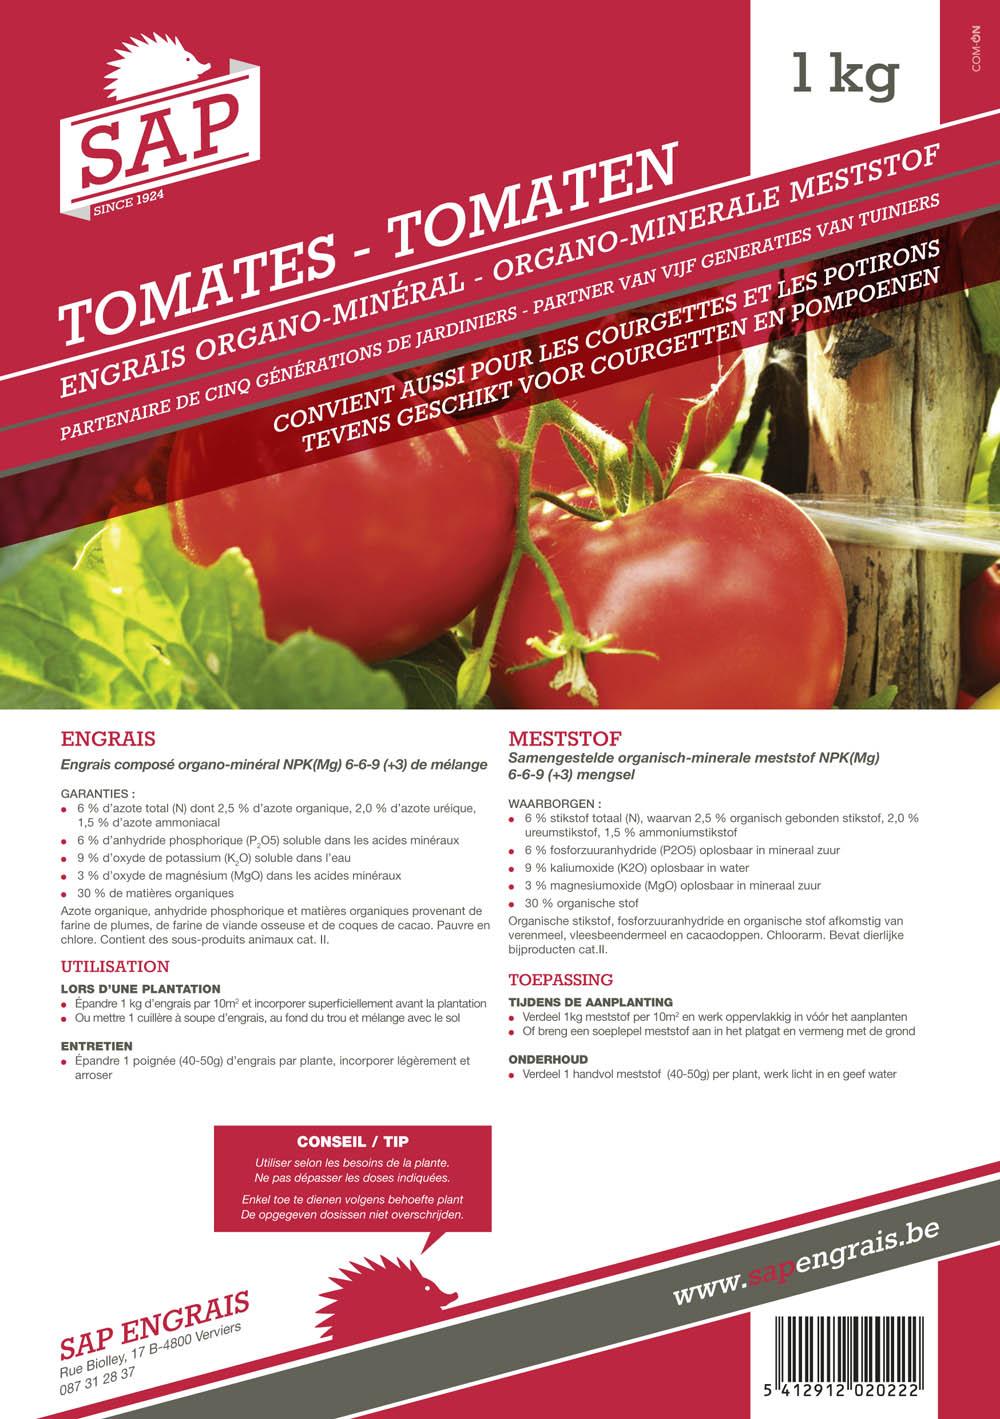 Engrais SAP Tomates 1kg